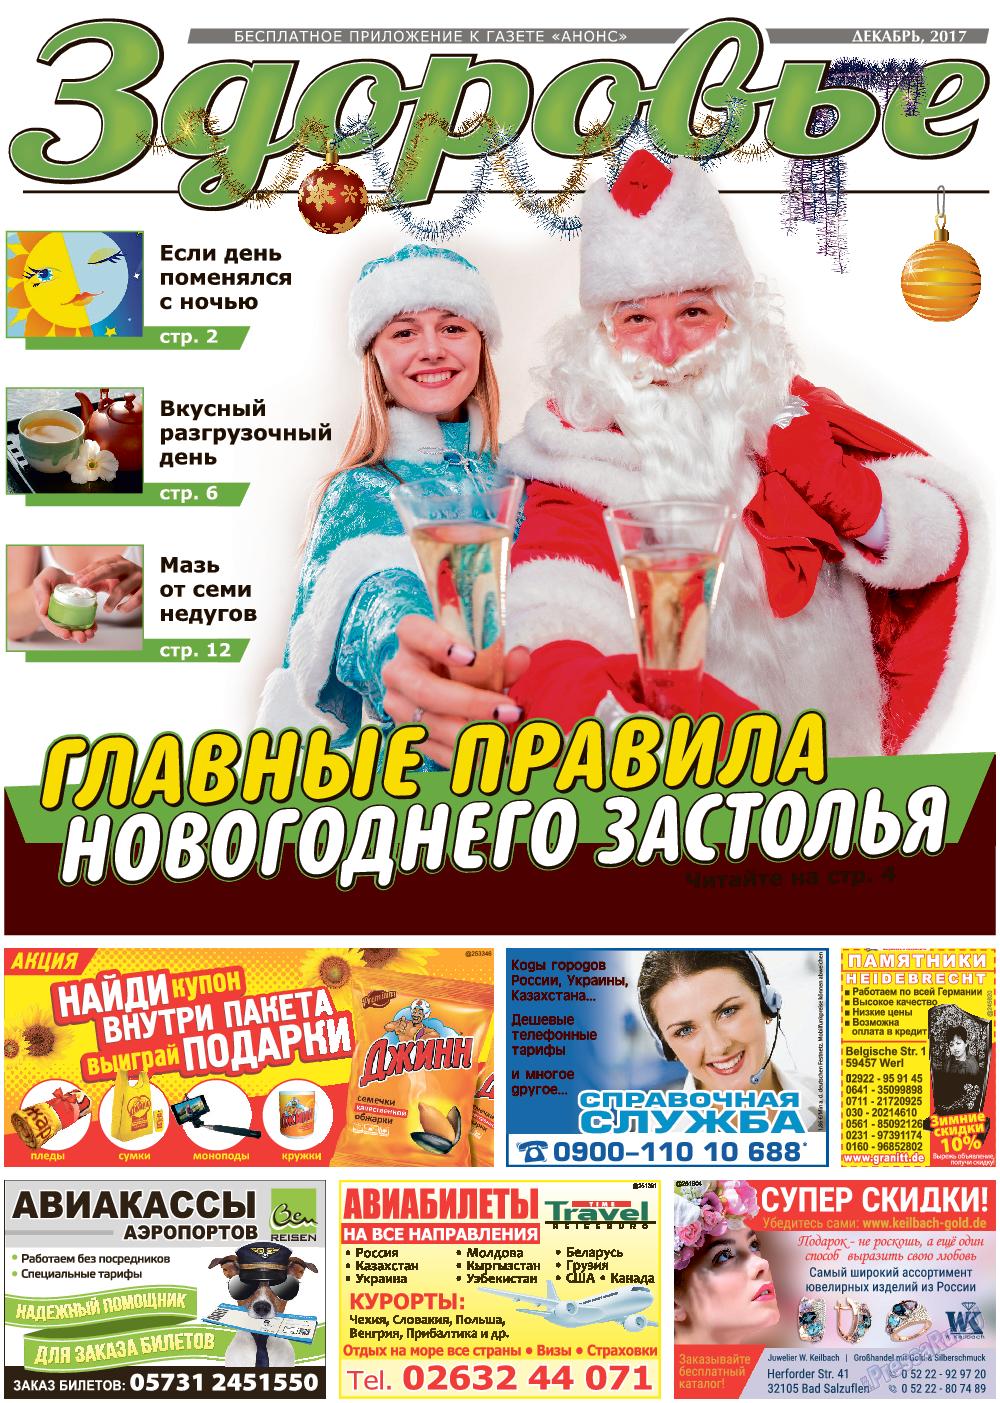 Здоровье (газета). 2017 год, номер 12, стр. 1